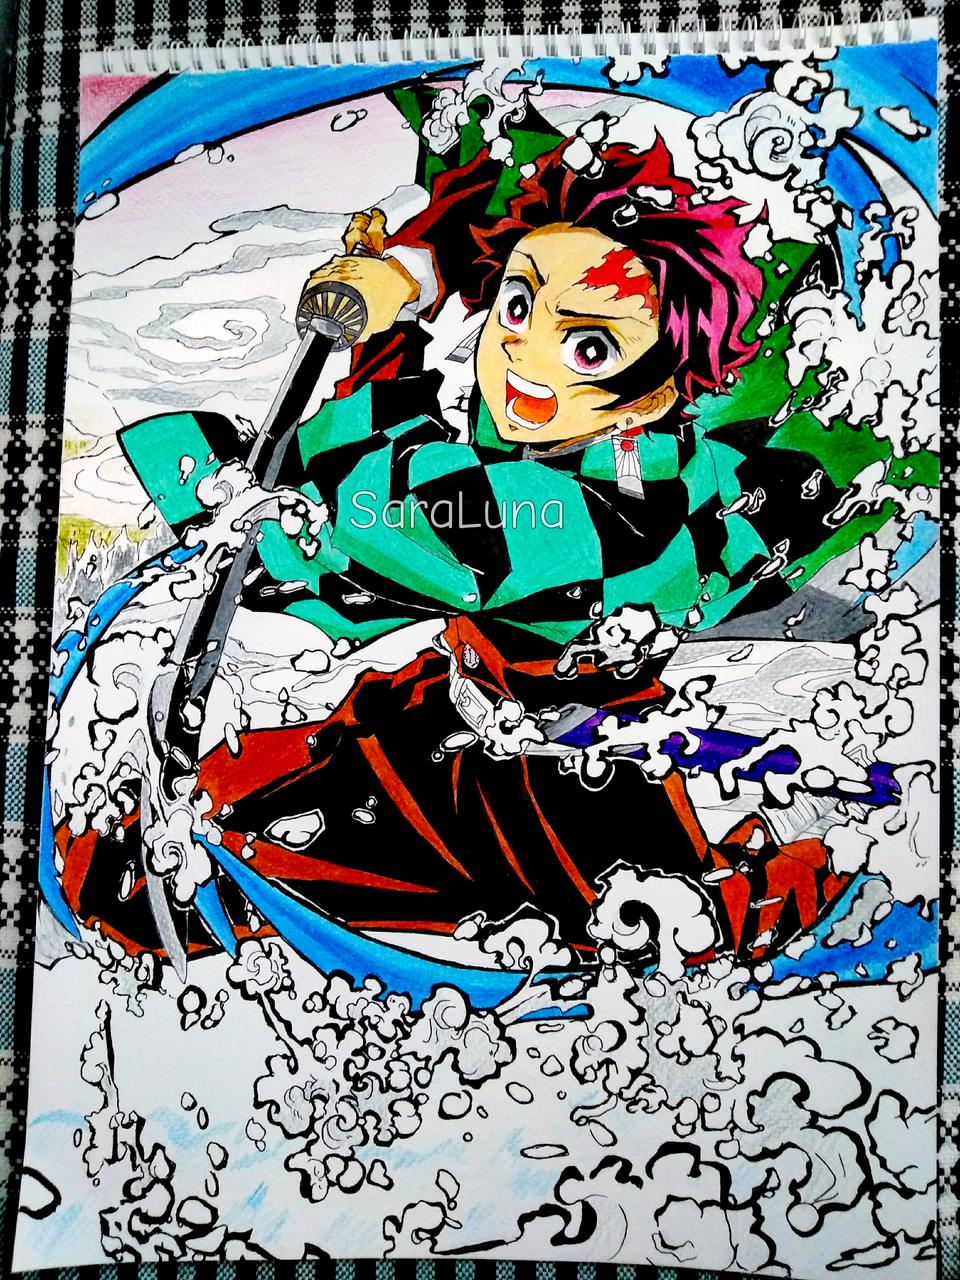 Kamado Tanjirou Illust of SaraLuna02 DemonSlayerFanartContest anime fanart KimetsunoYaiba traditionalart manga art KamadoTanjirou traditional boy